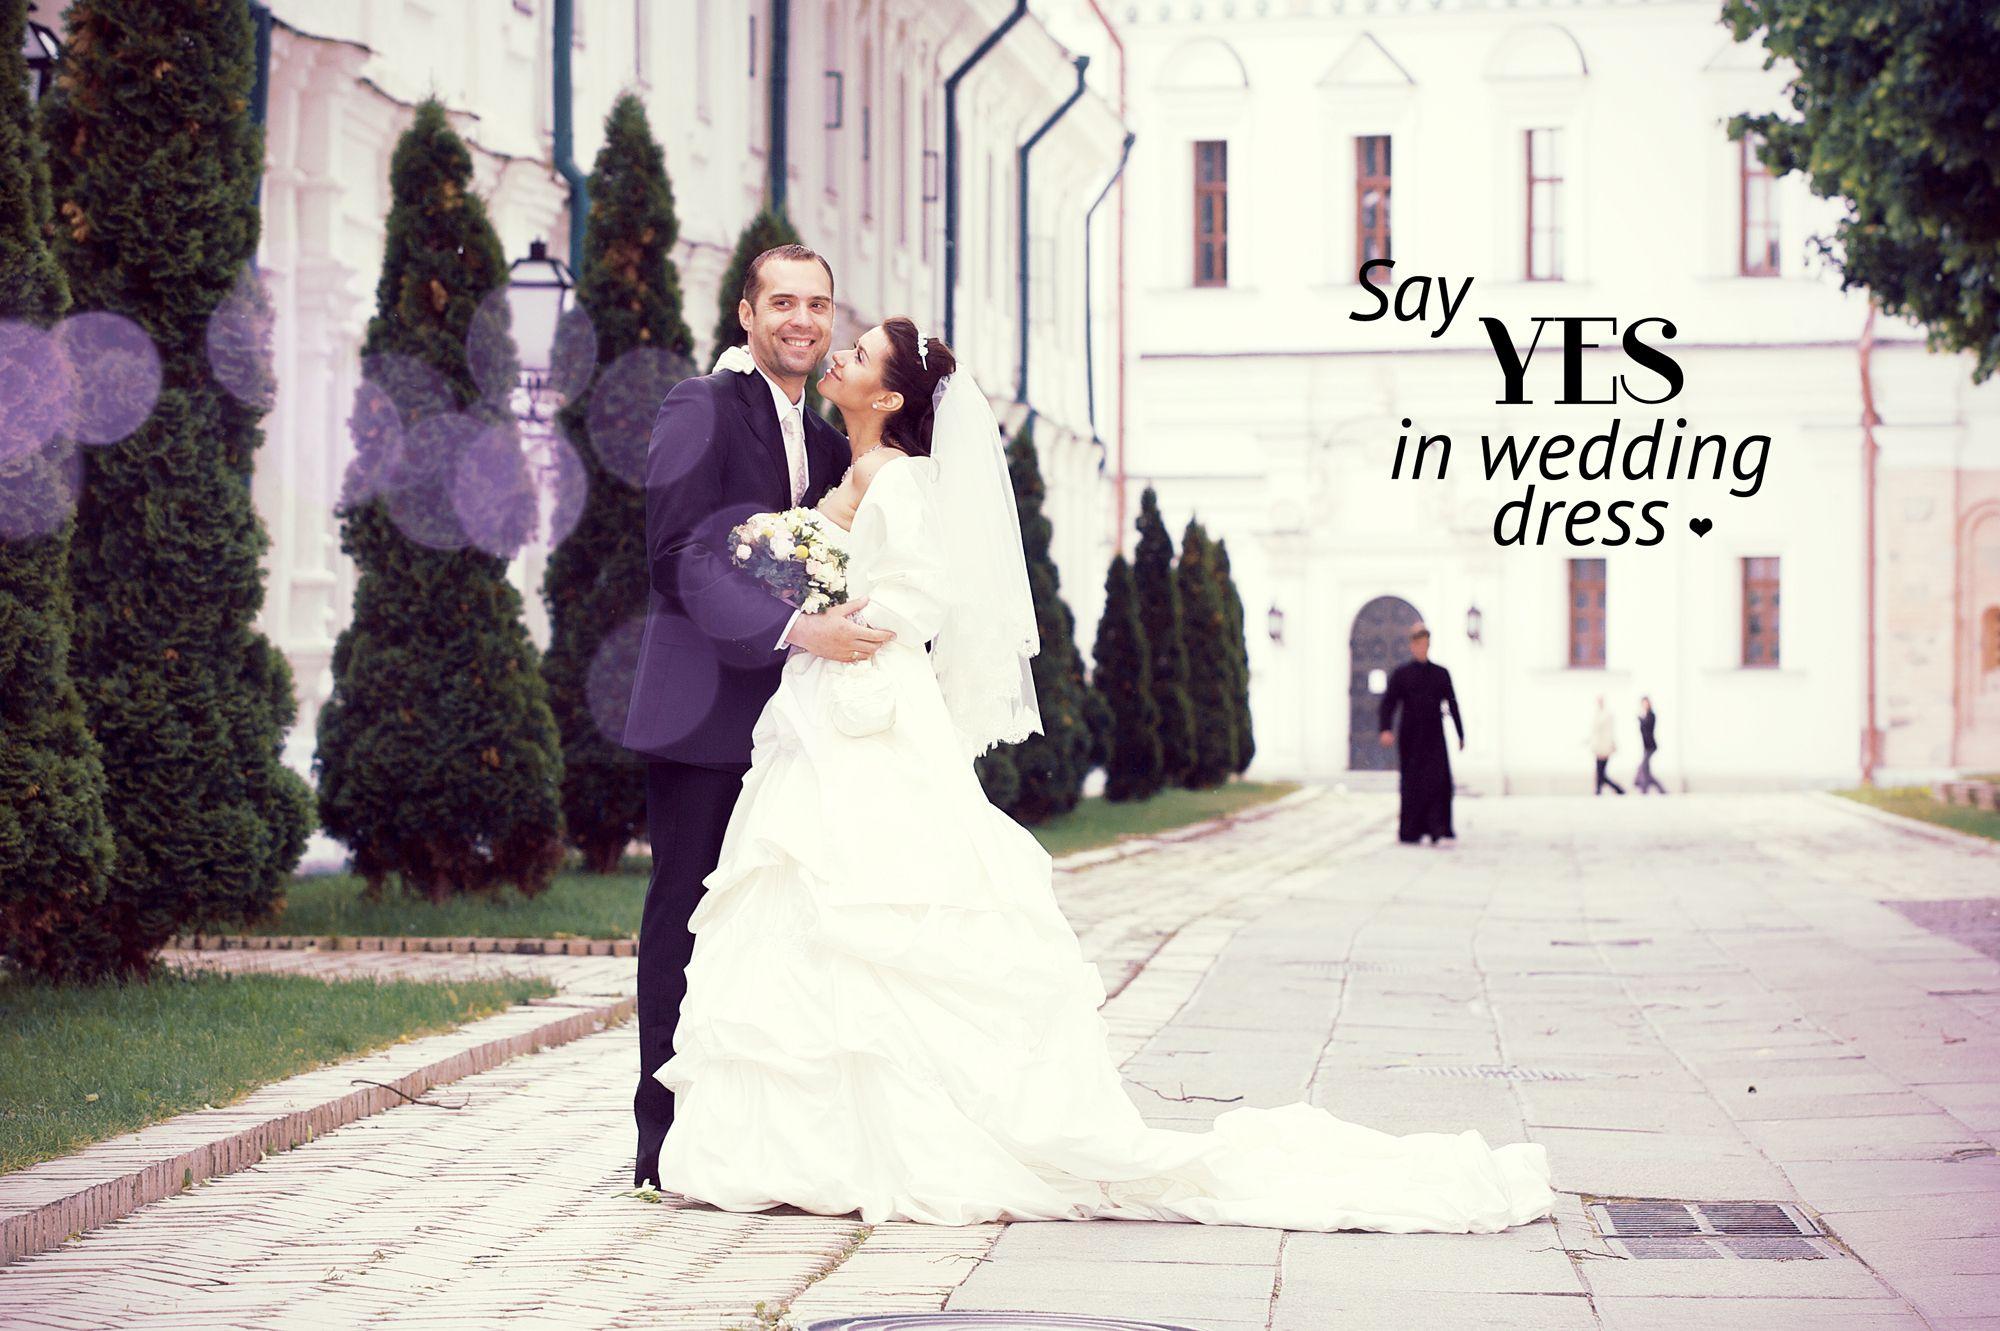 Картинки жених и невеста молодая пара